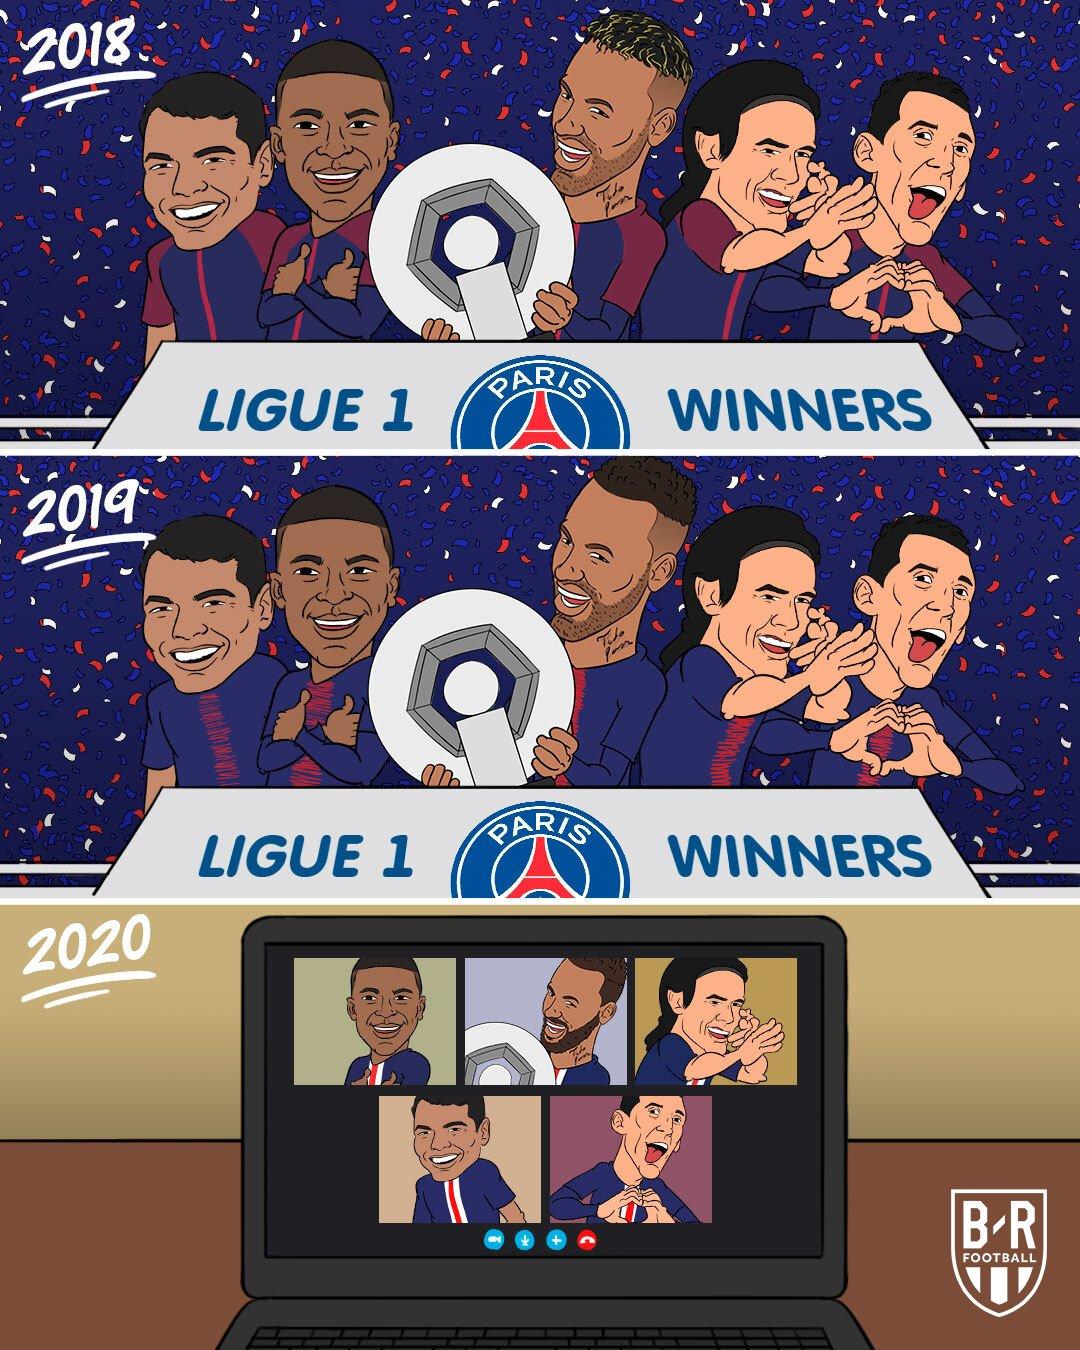 B/R海报:巴黎获得本赛季法甲冠军,队史第9座